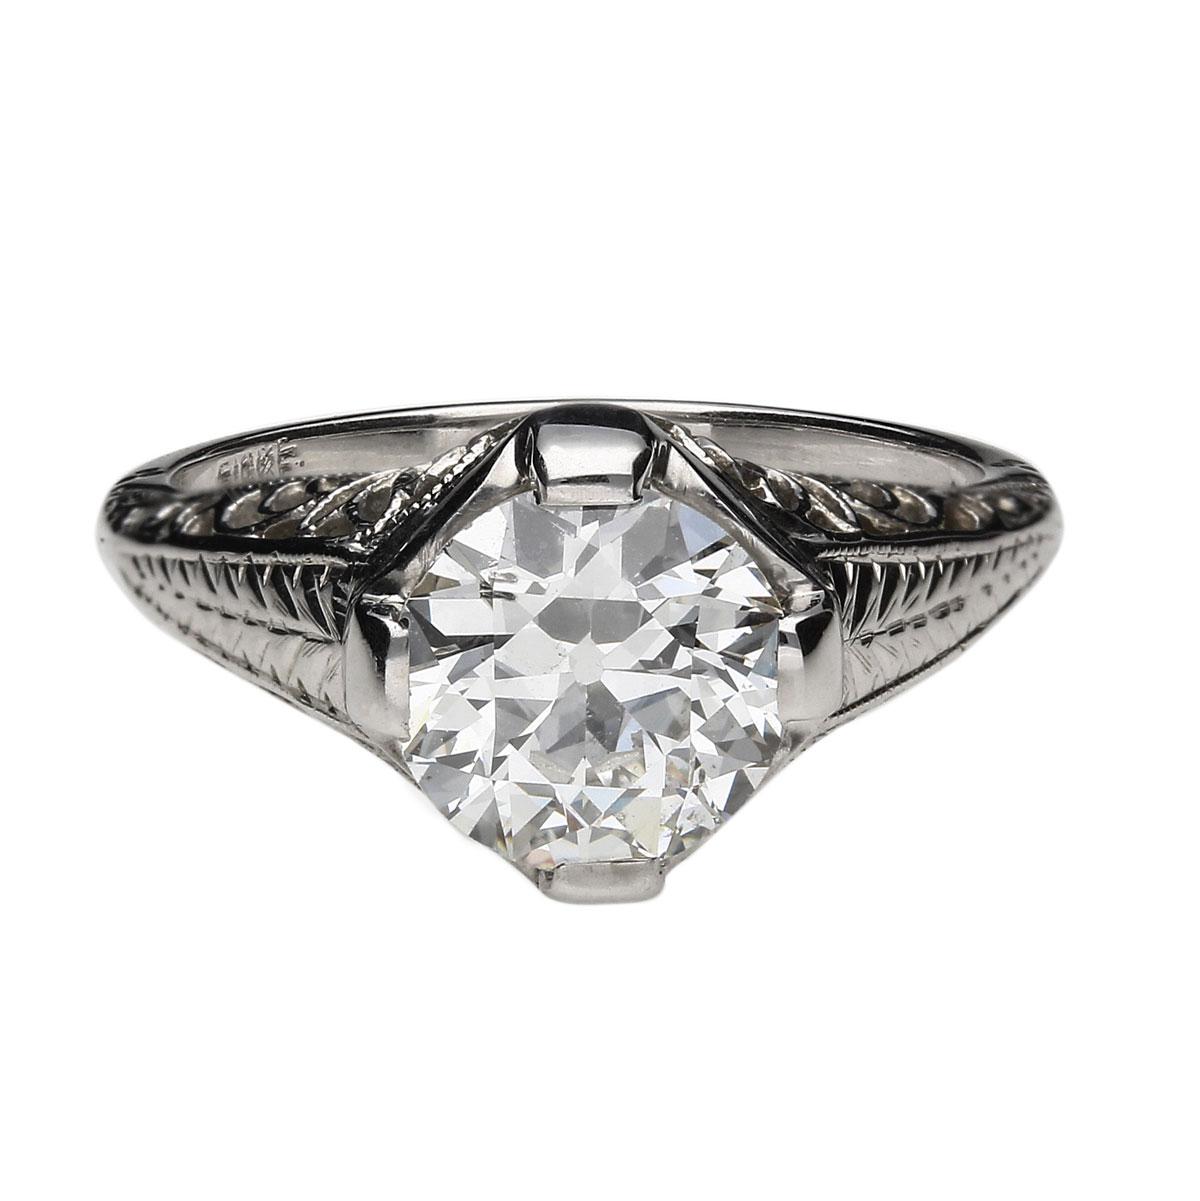 Vintage Art Deco Filigree Engagement Ring (1.78 TCW)